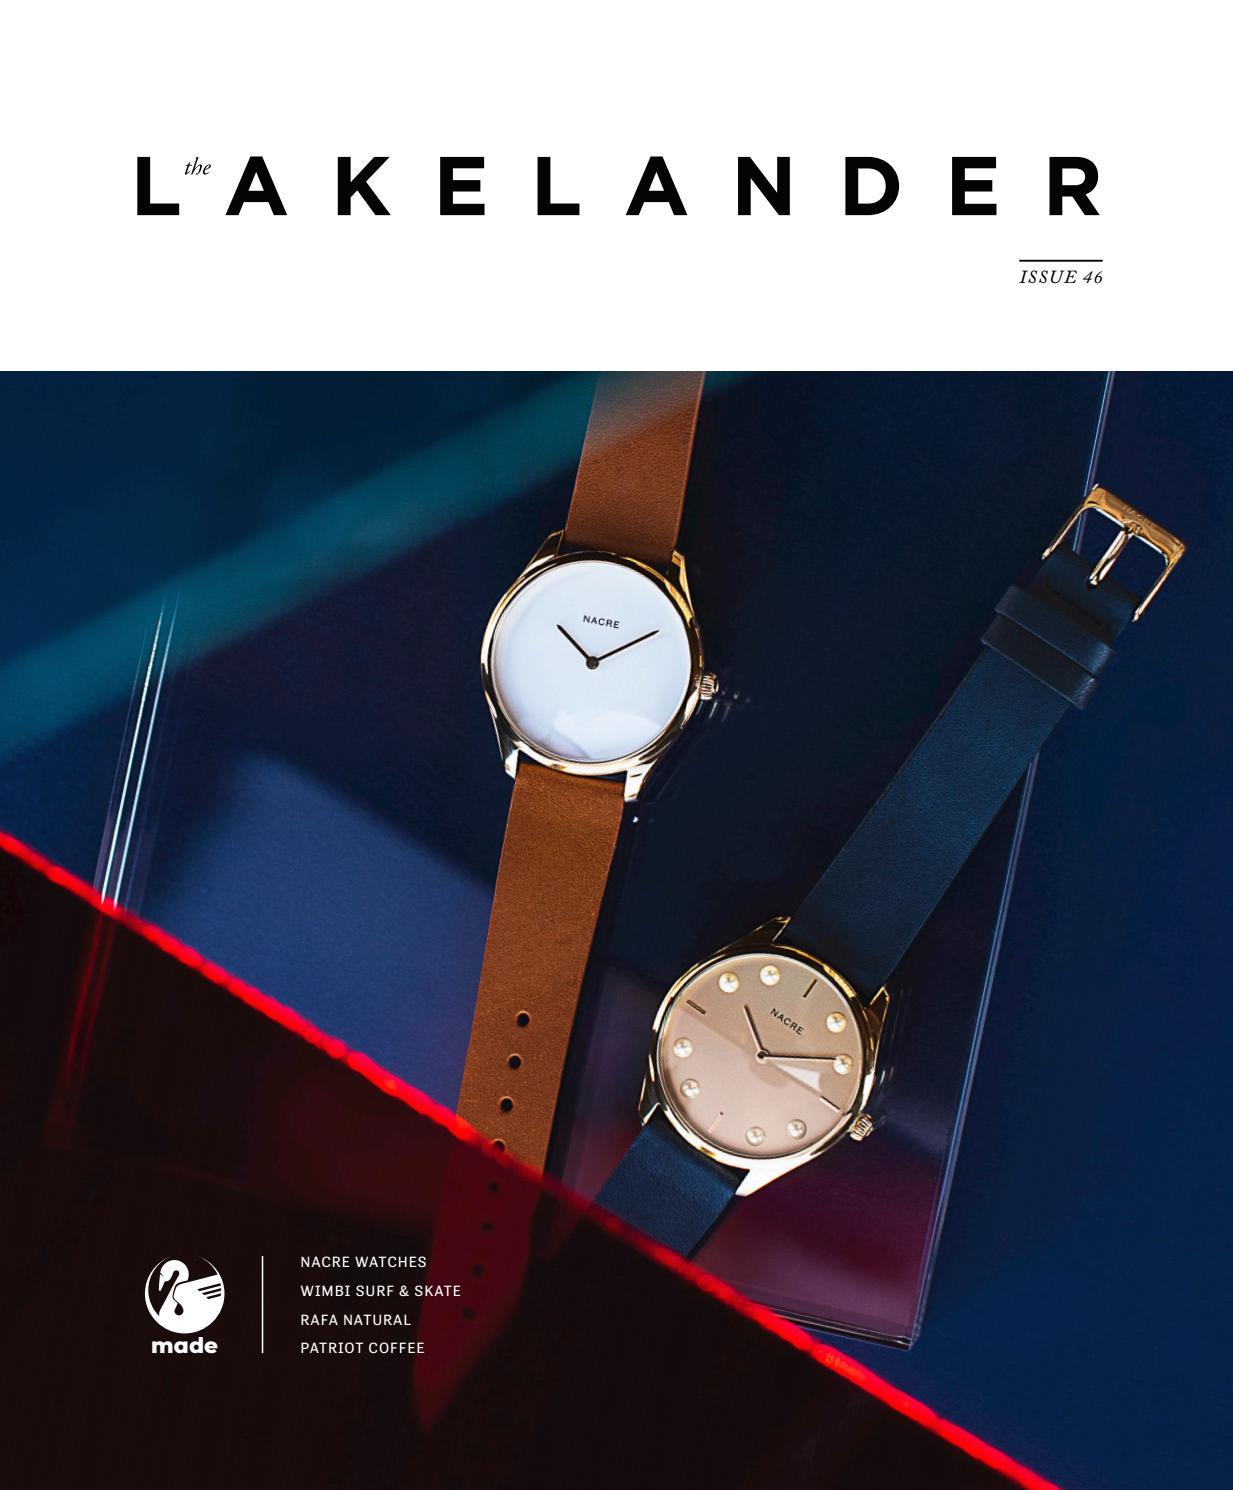 c9d82a432e5d The Lakelander - Issue 46   Lakelander Made by The Lakelander - issuu